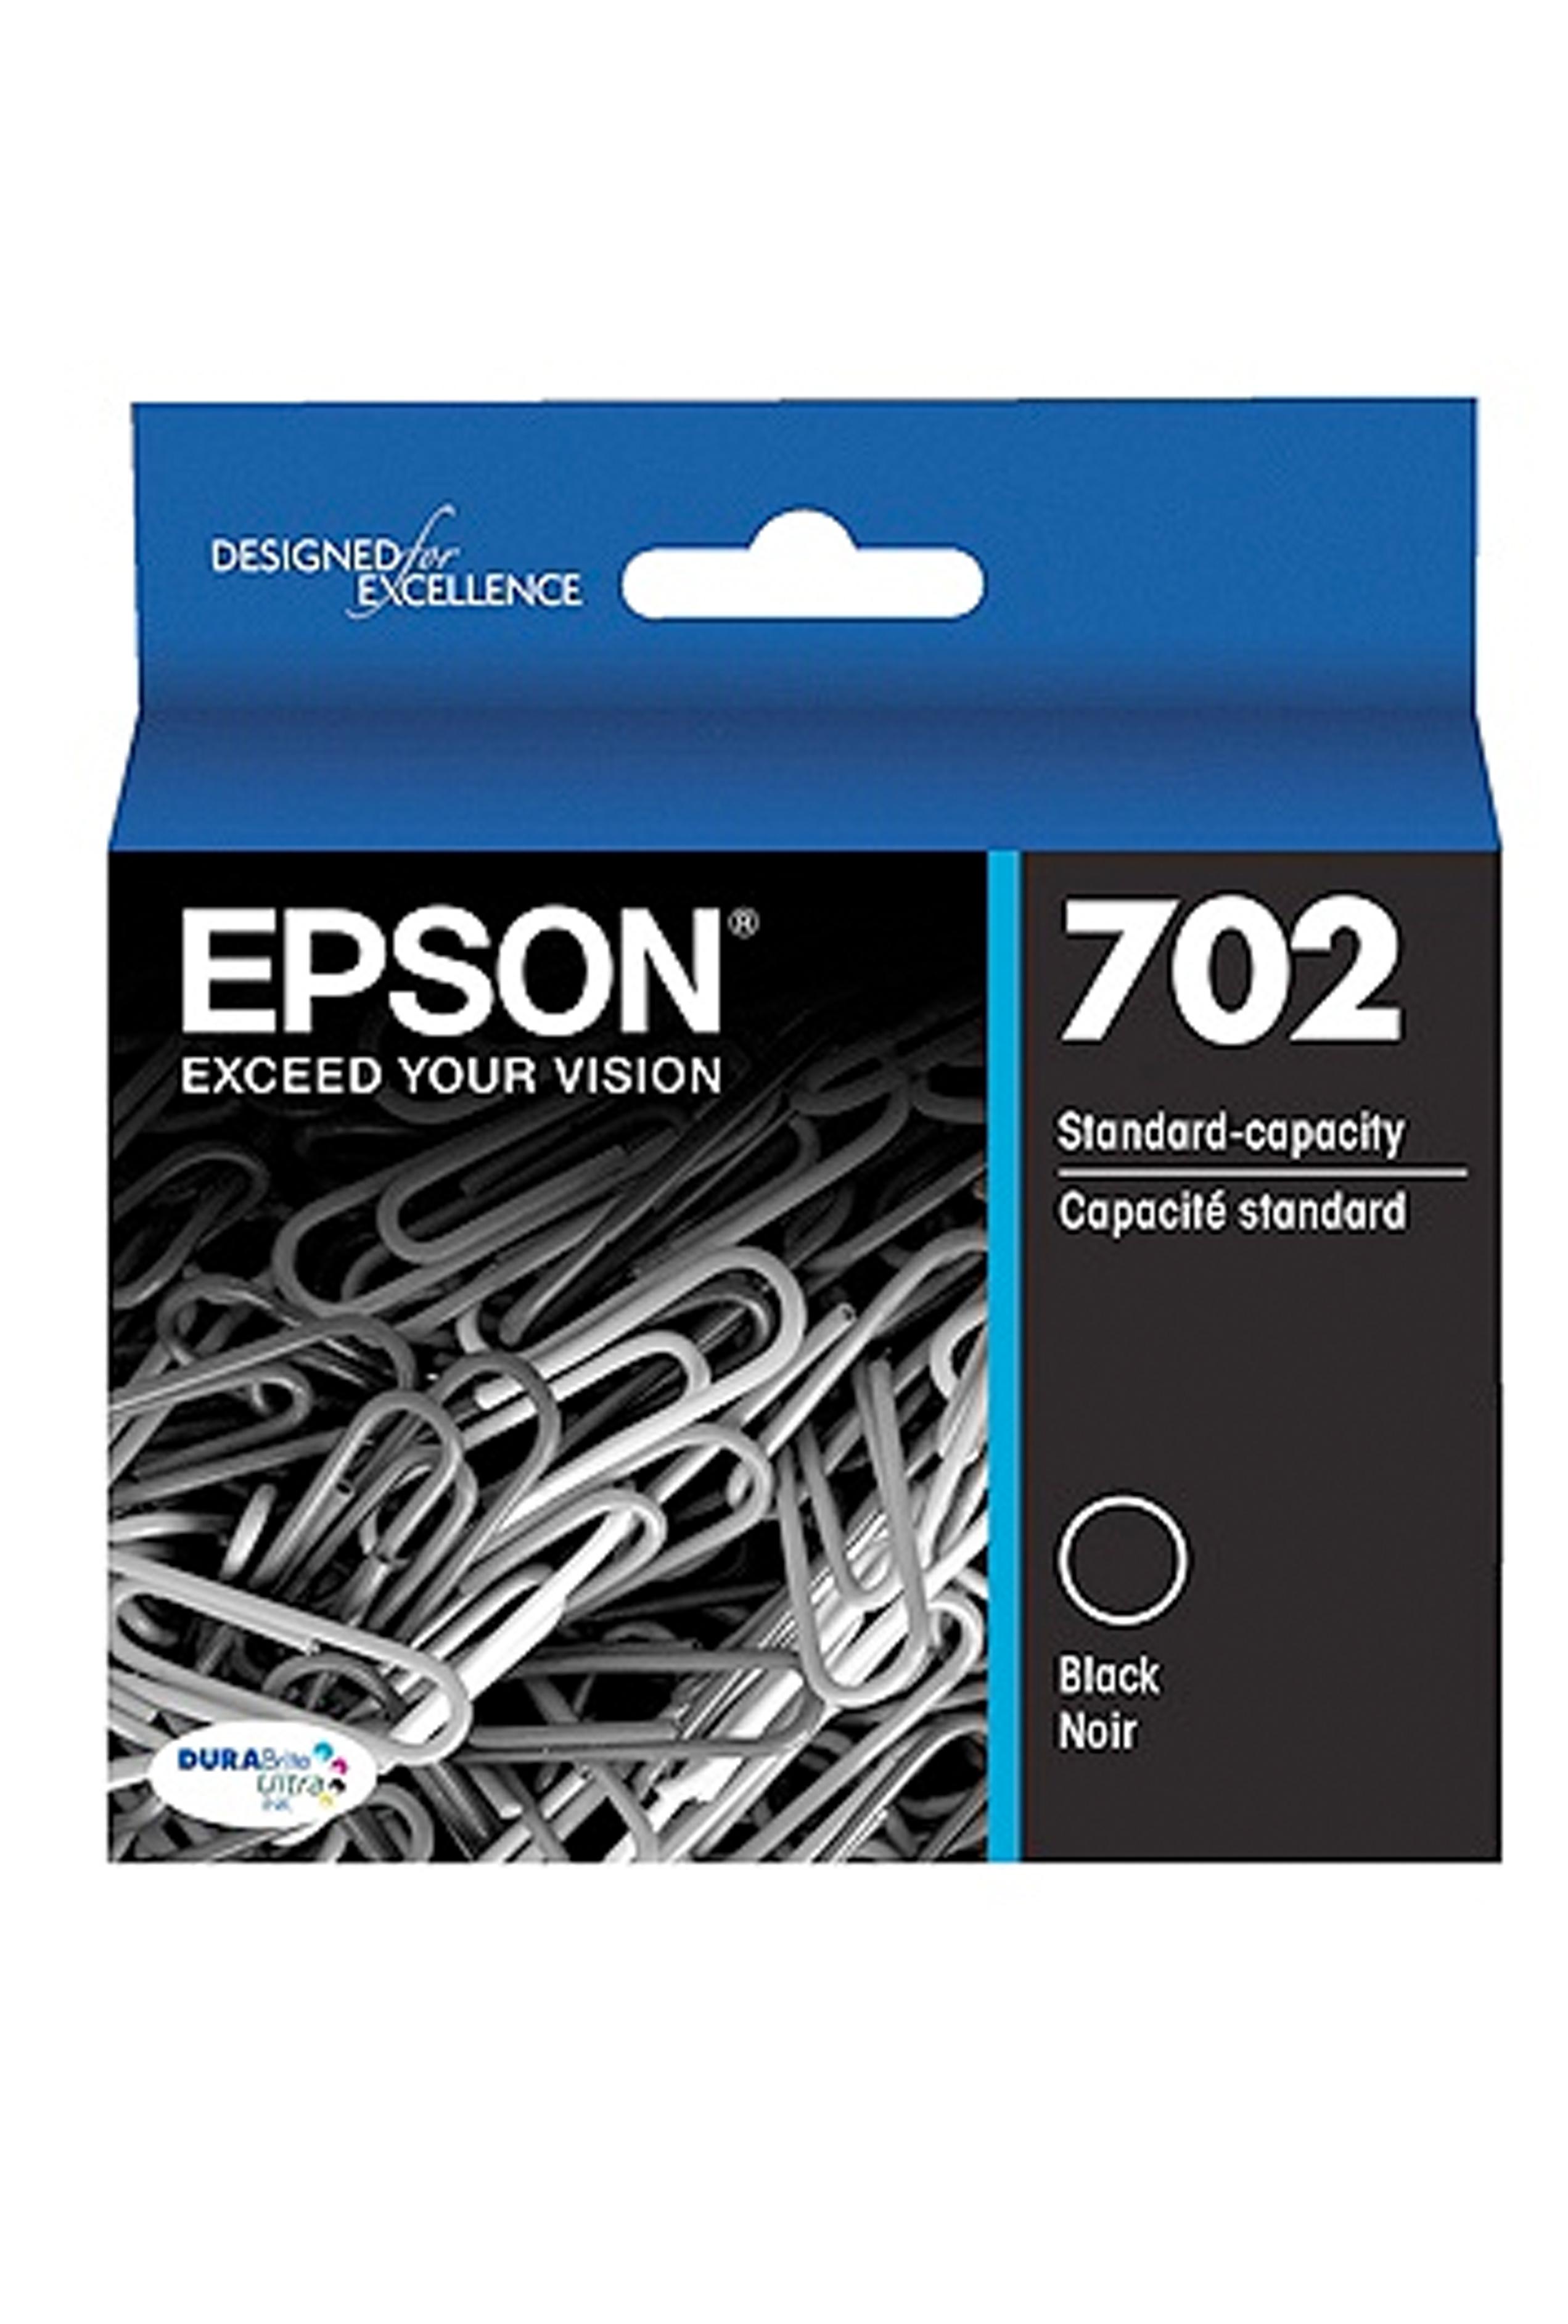 Epson T702, Black Ink Cartridge (T702120-S)